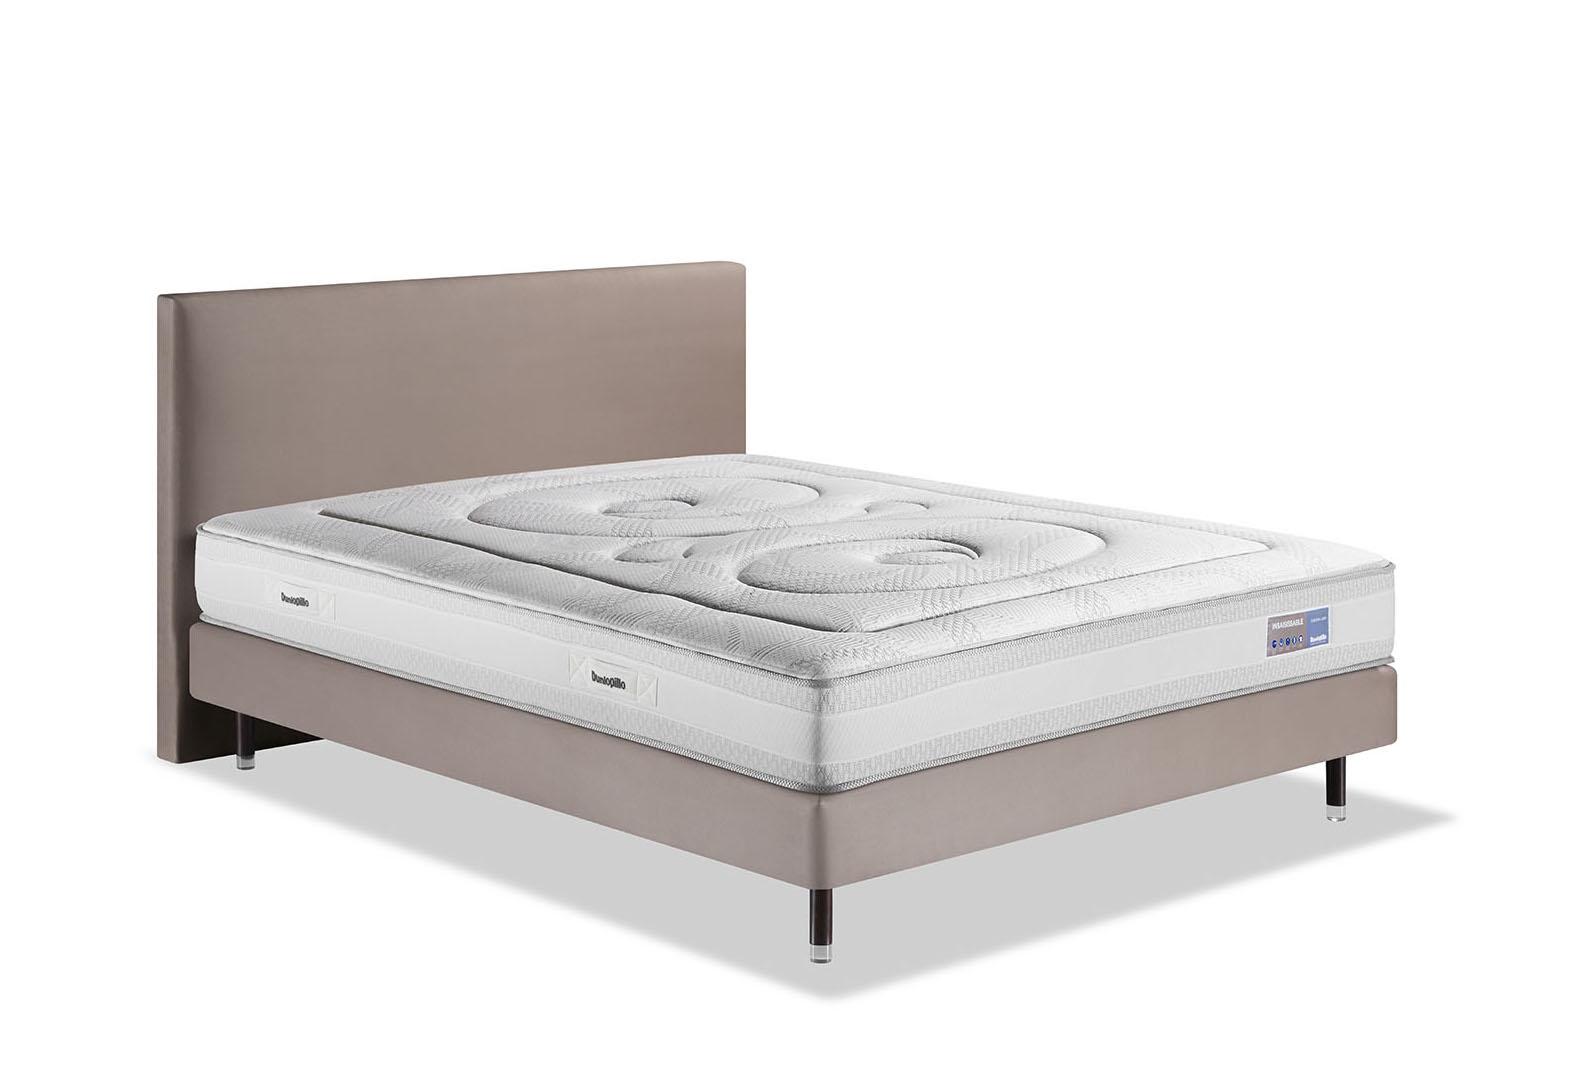 prix matelas latex 140x190 finest matelas matelas latex pirelli cassandre x pirelli with prix. Black Bedroom Furniture Sets. Home Design Ideas